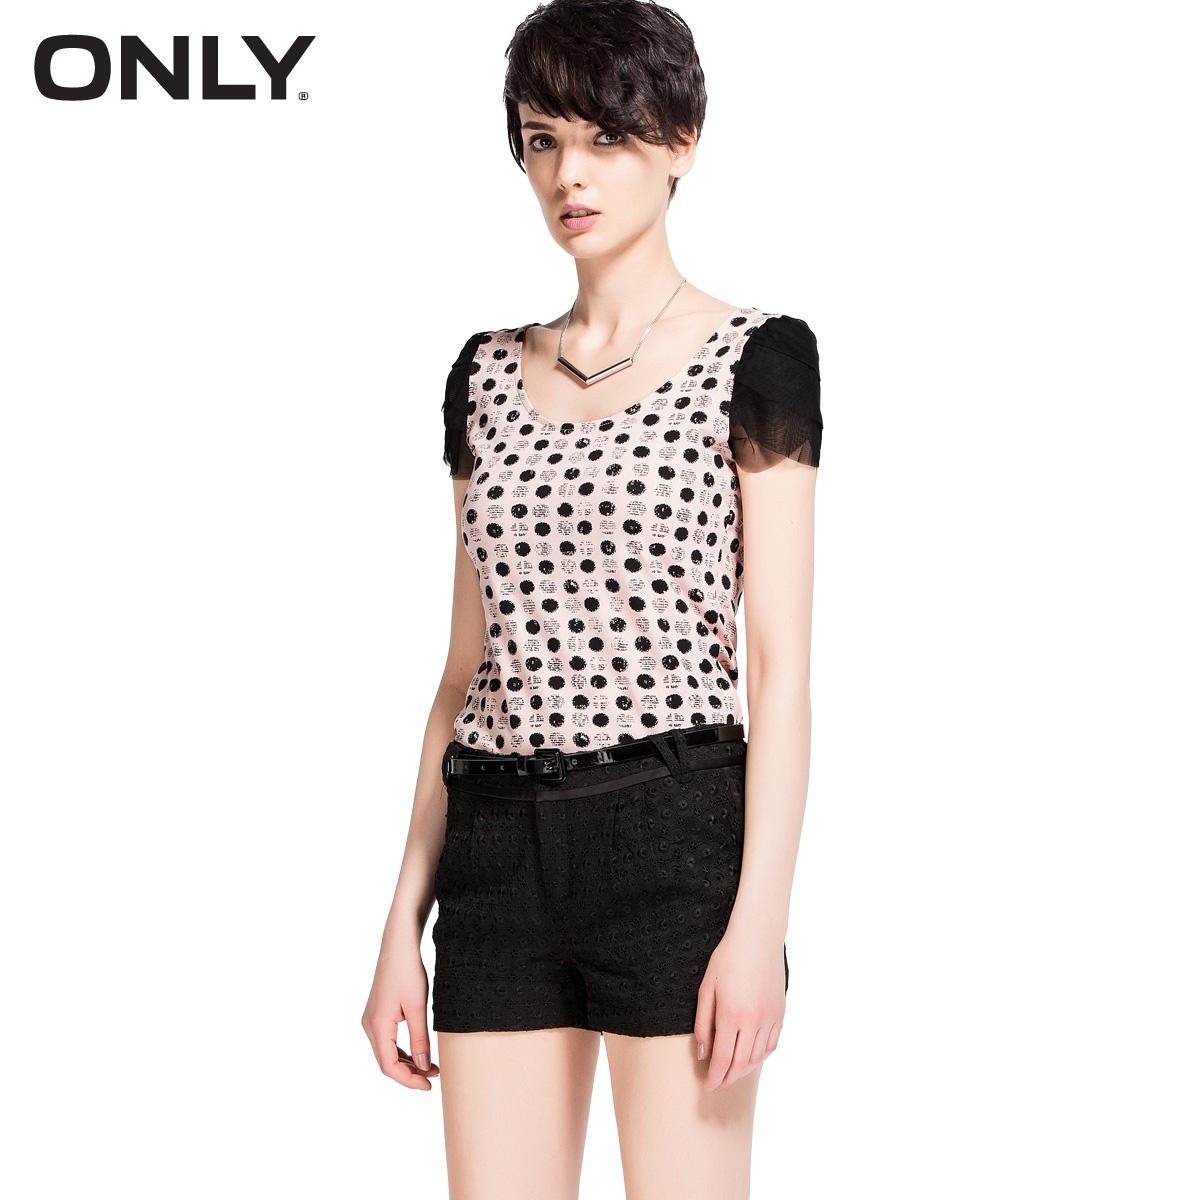 Only xiaxin chiffon polka dot slim puff sleeve top o-neck bow t-shirt female short-sleeve l 113201128(China (Mainland))